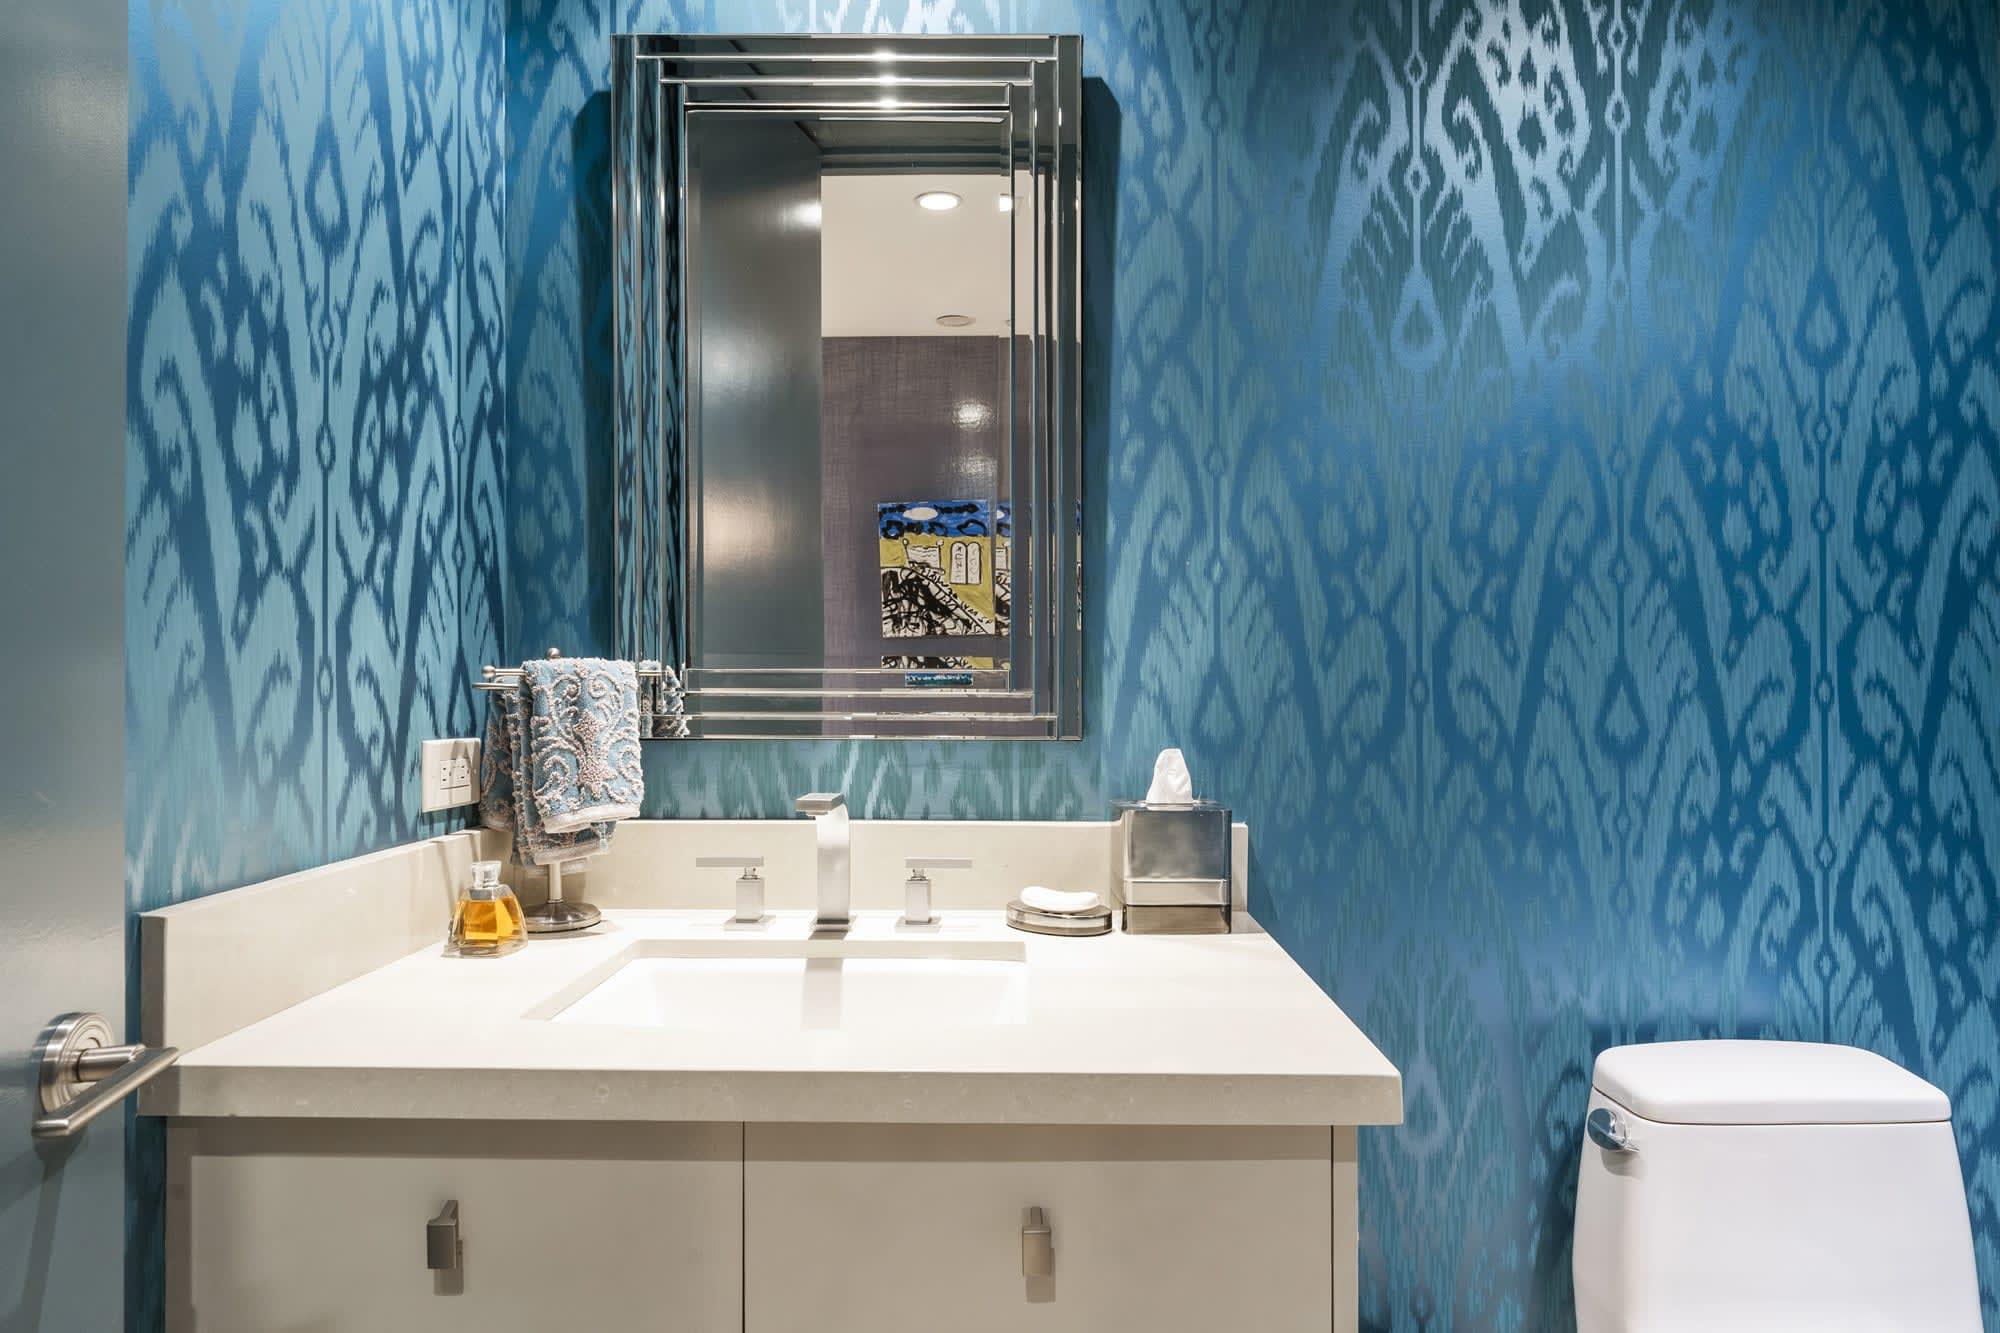 blue damask wallpaper in a sierra towers luxury condominium